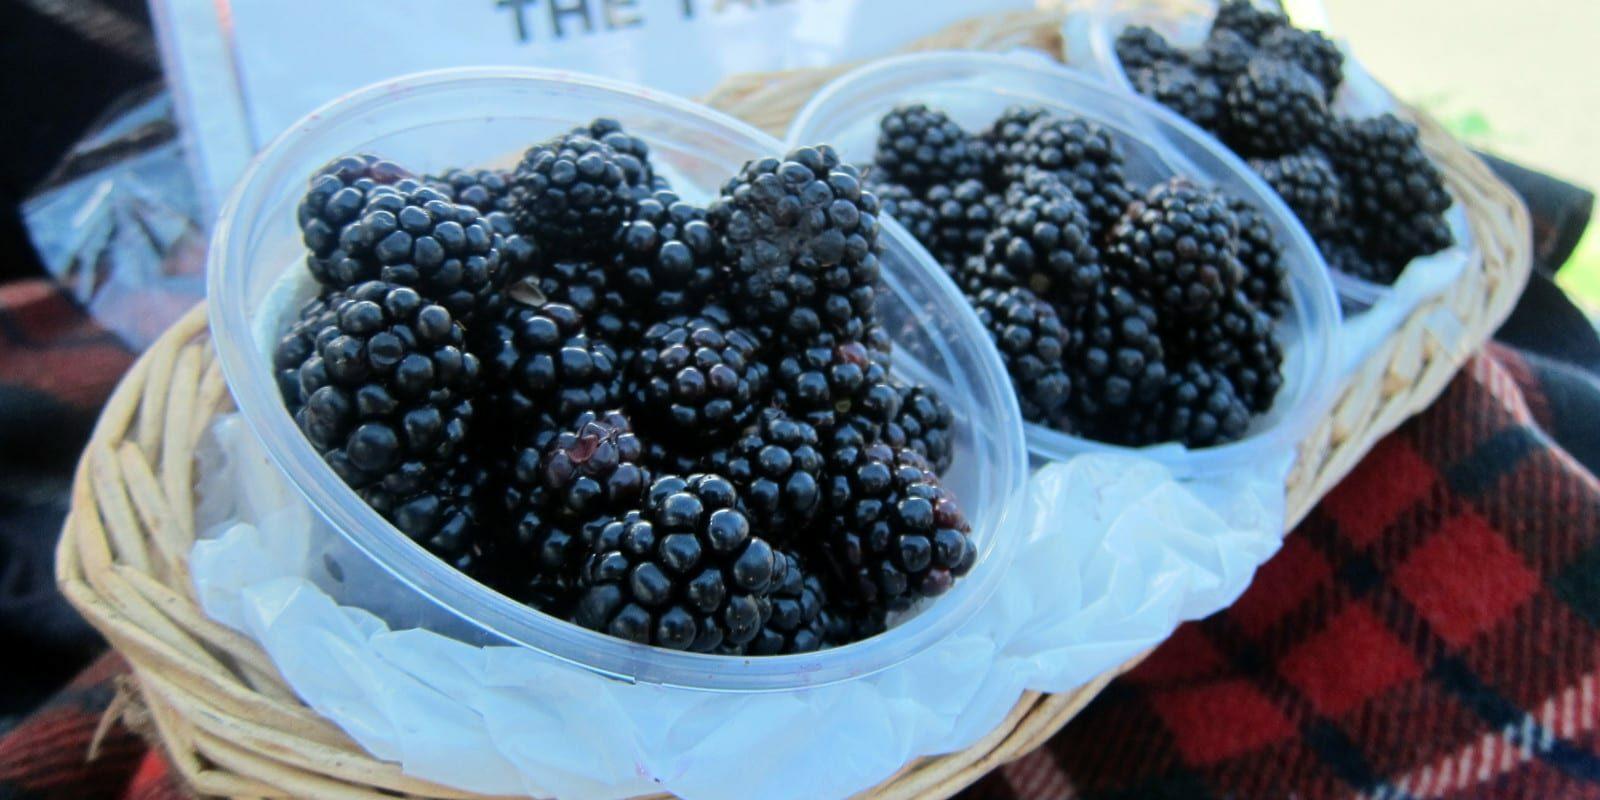 Best Denver Farmers Markets Old South Pearl Blackberries